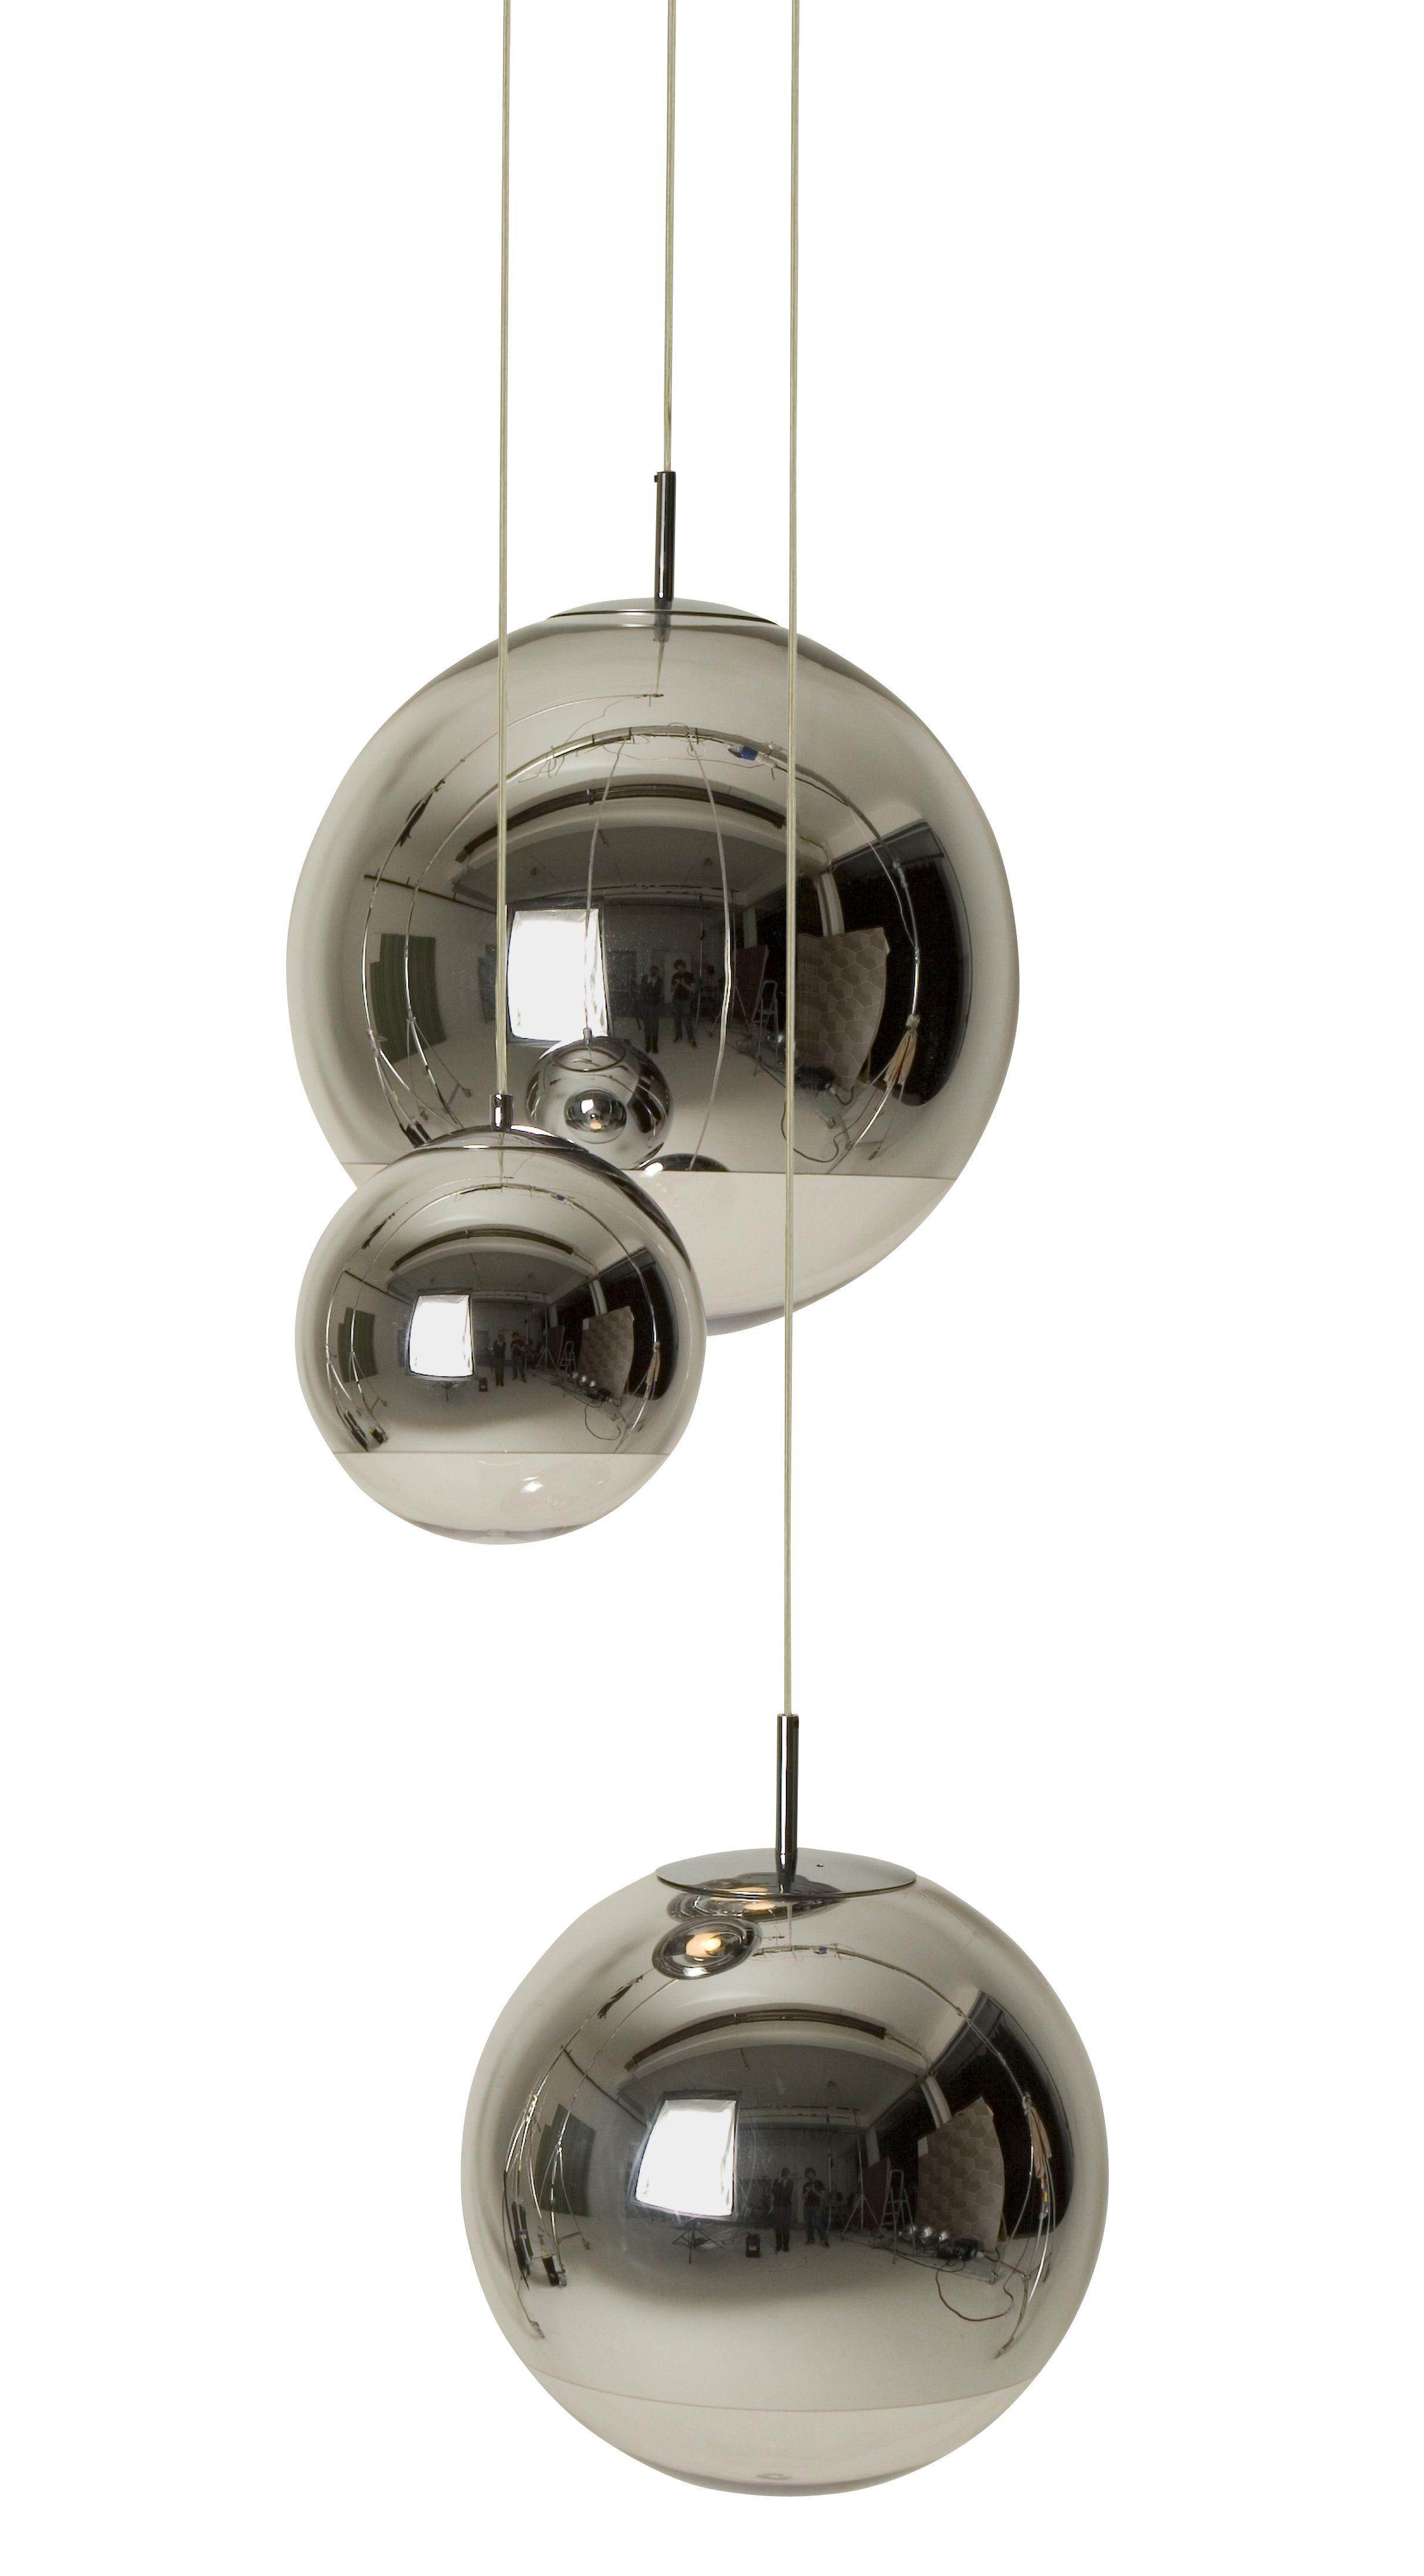 Tom Dixon Mirror Ball Large Pendant Metal Made In Design Uk Ball Pendant Lighting Tom Dixon Pendant Lamps Tom Dixon Pendant Light